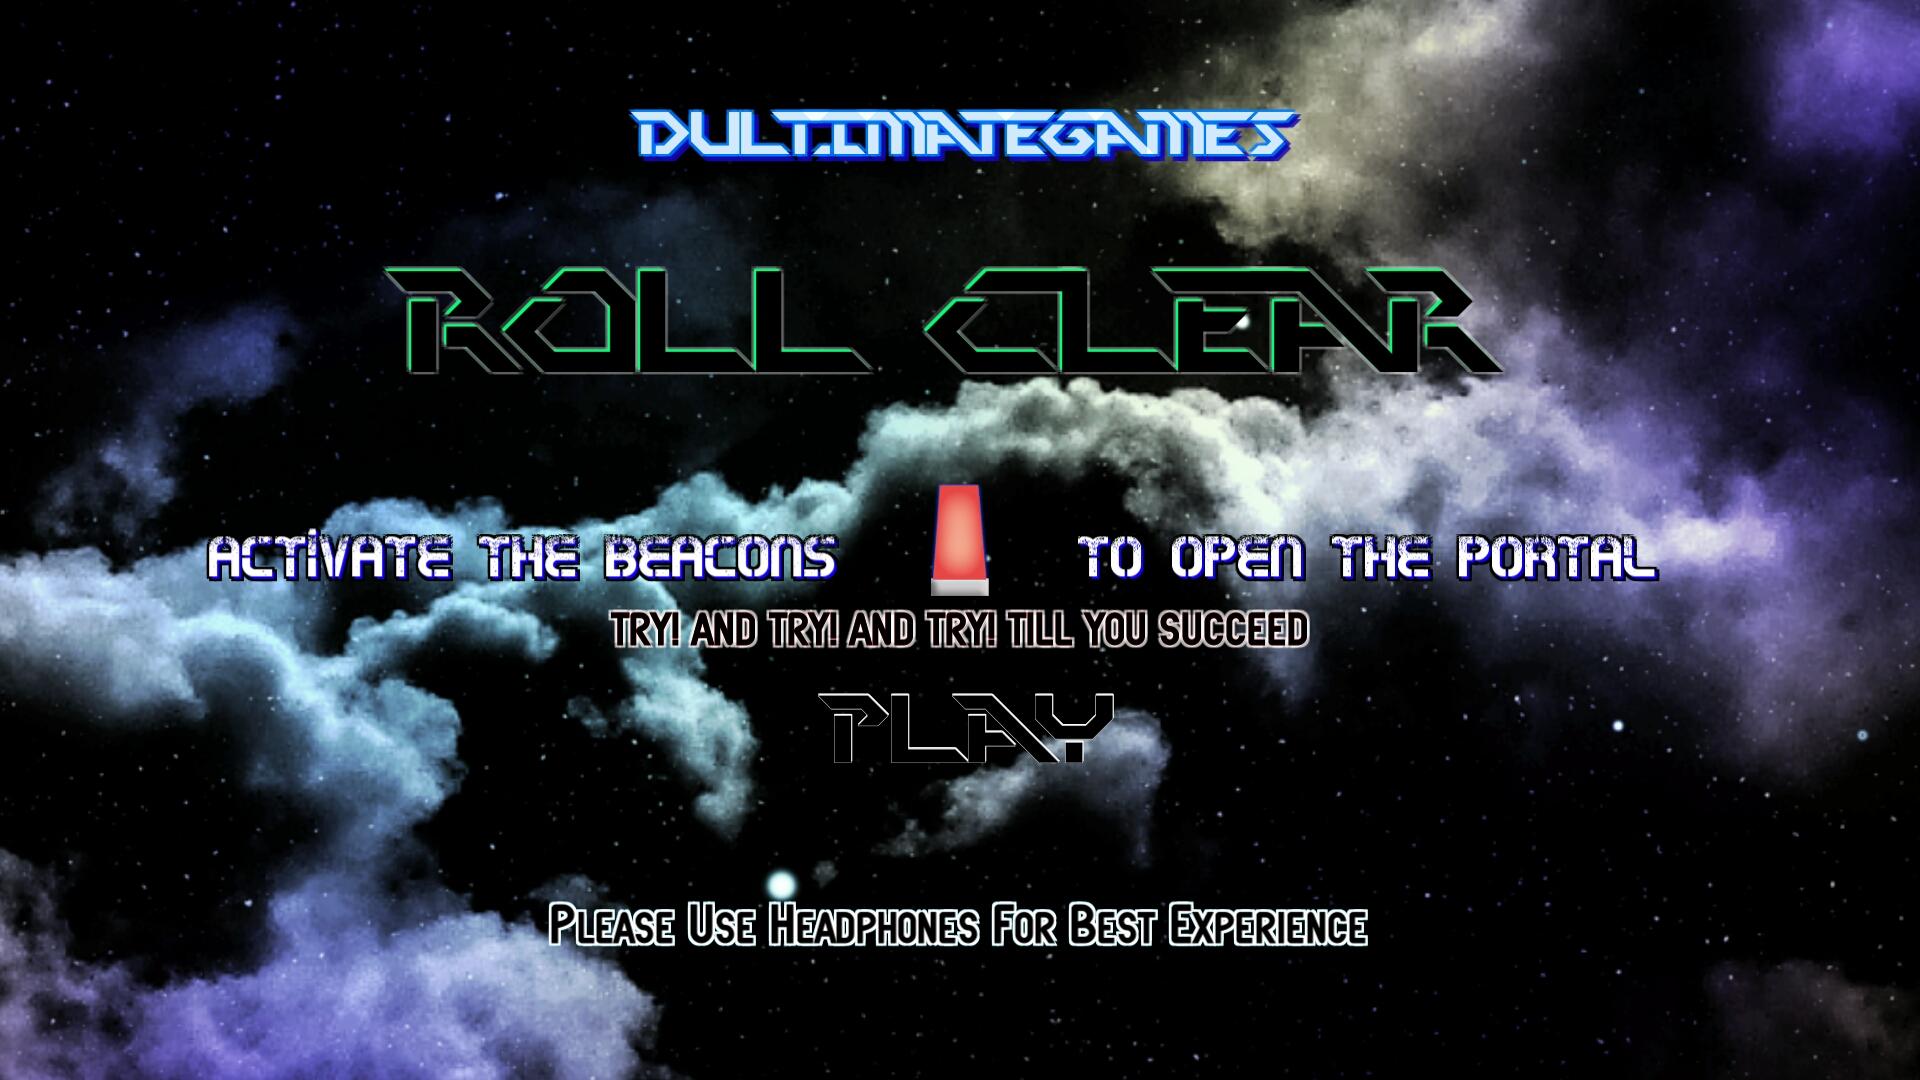 RollClear